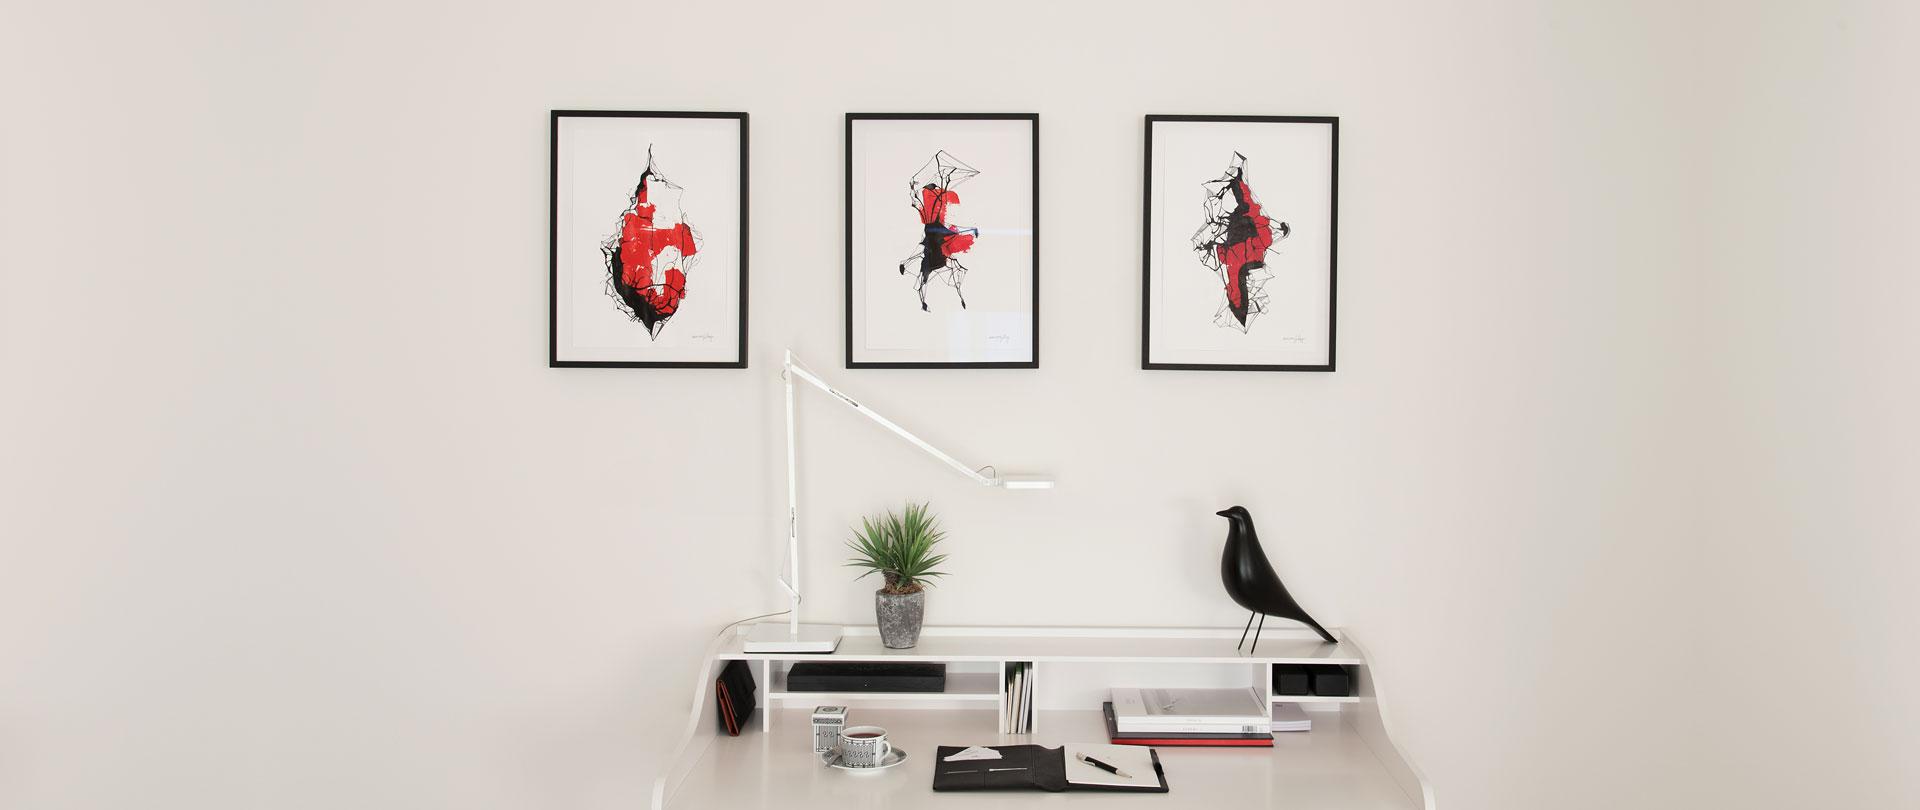 Abstract; Geometric; Frame; Interior; Desk; Lamp; Vitra; Lignet Roset; Living Room; Painting; Acrylic; Ink; Paper; Illustration